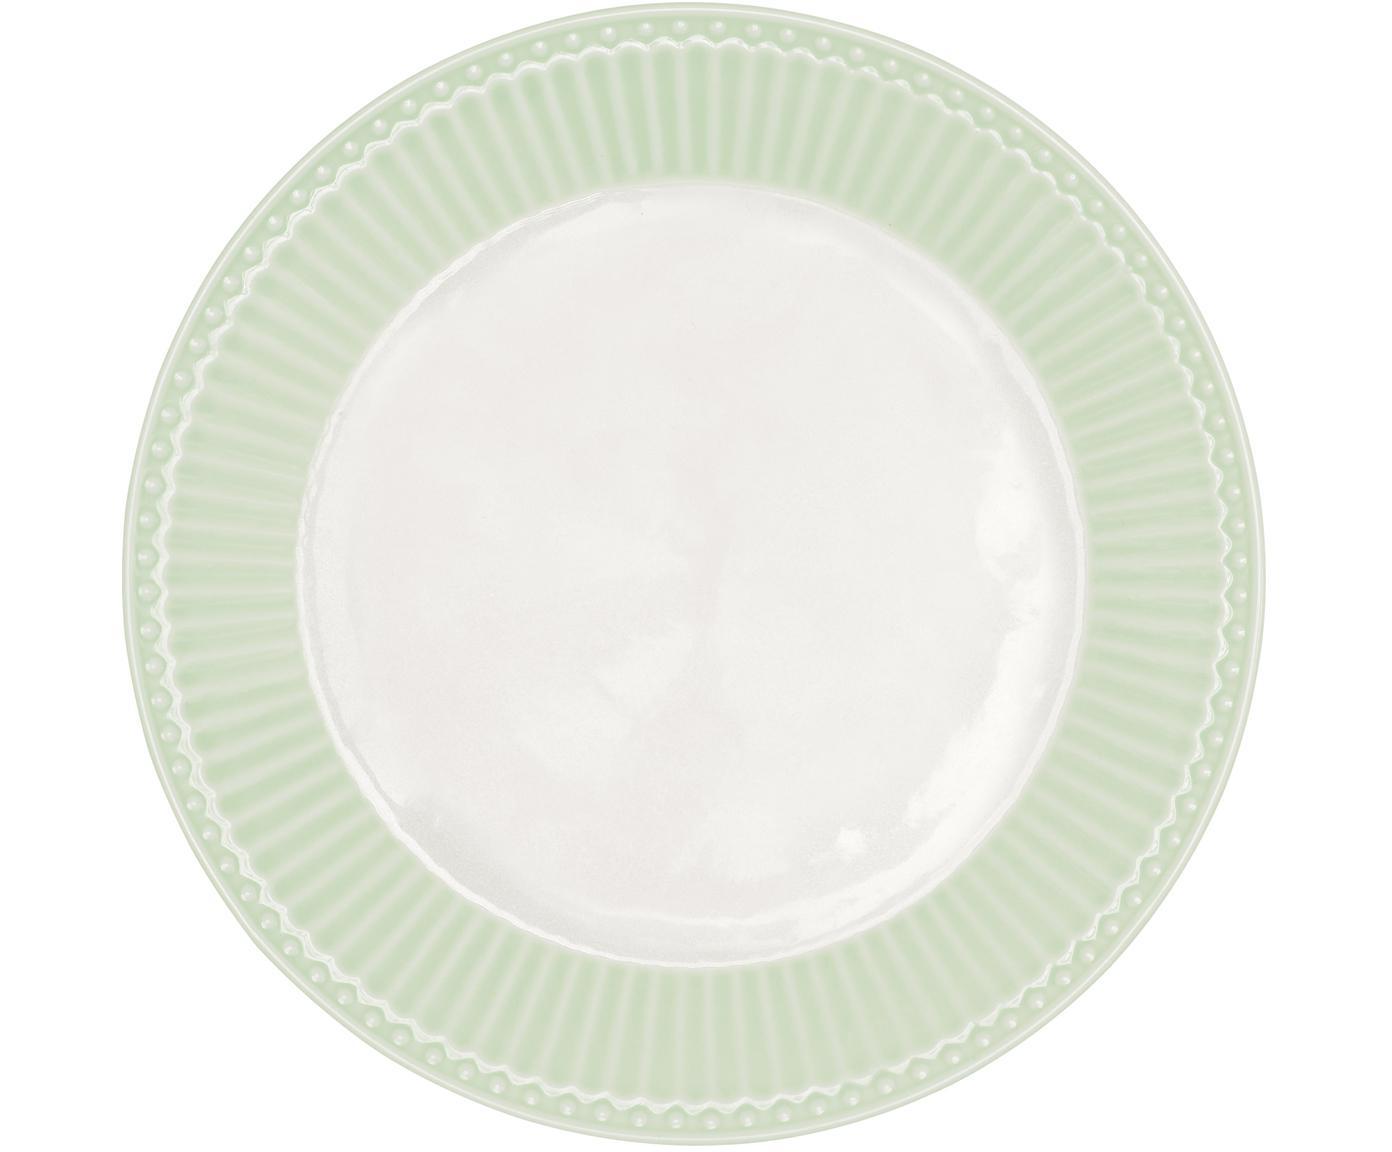 Platos postre Alice, 2uds., Porcelana, Verde menta, blanco, Ø 23 cm